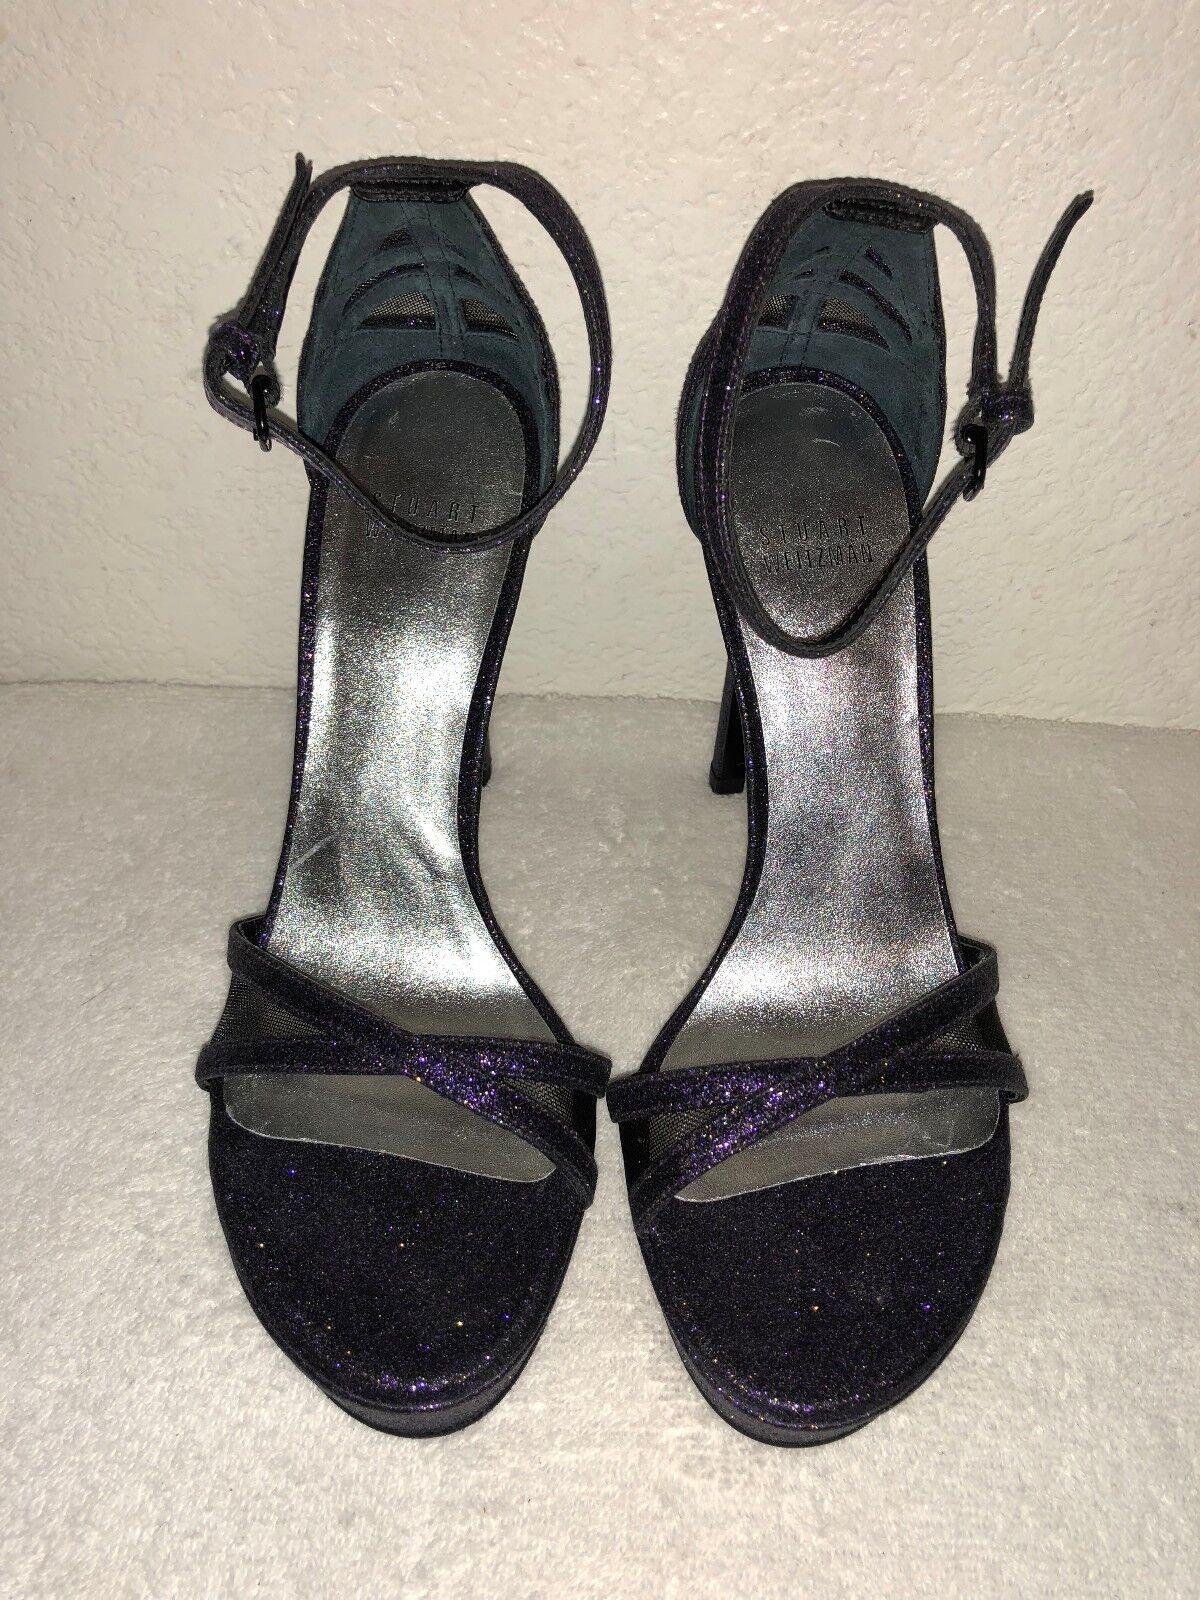 Stuart Weitzman Tiz you Glitter Glitter Glitter Platform Ankle Strap Sandals Größe 7 f765c0